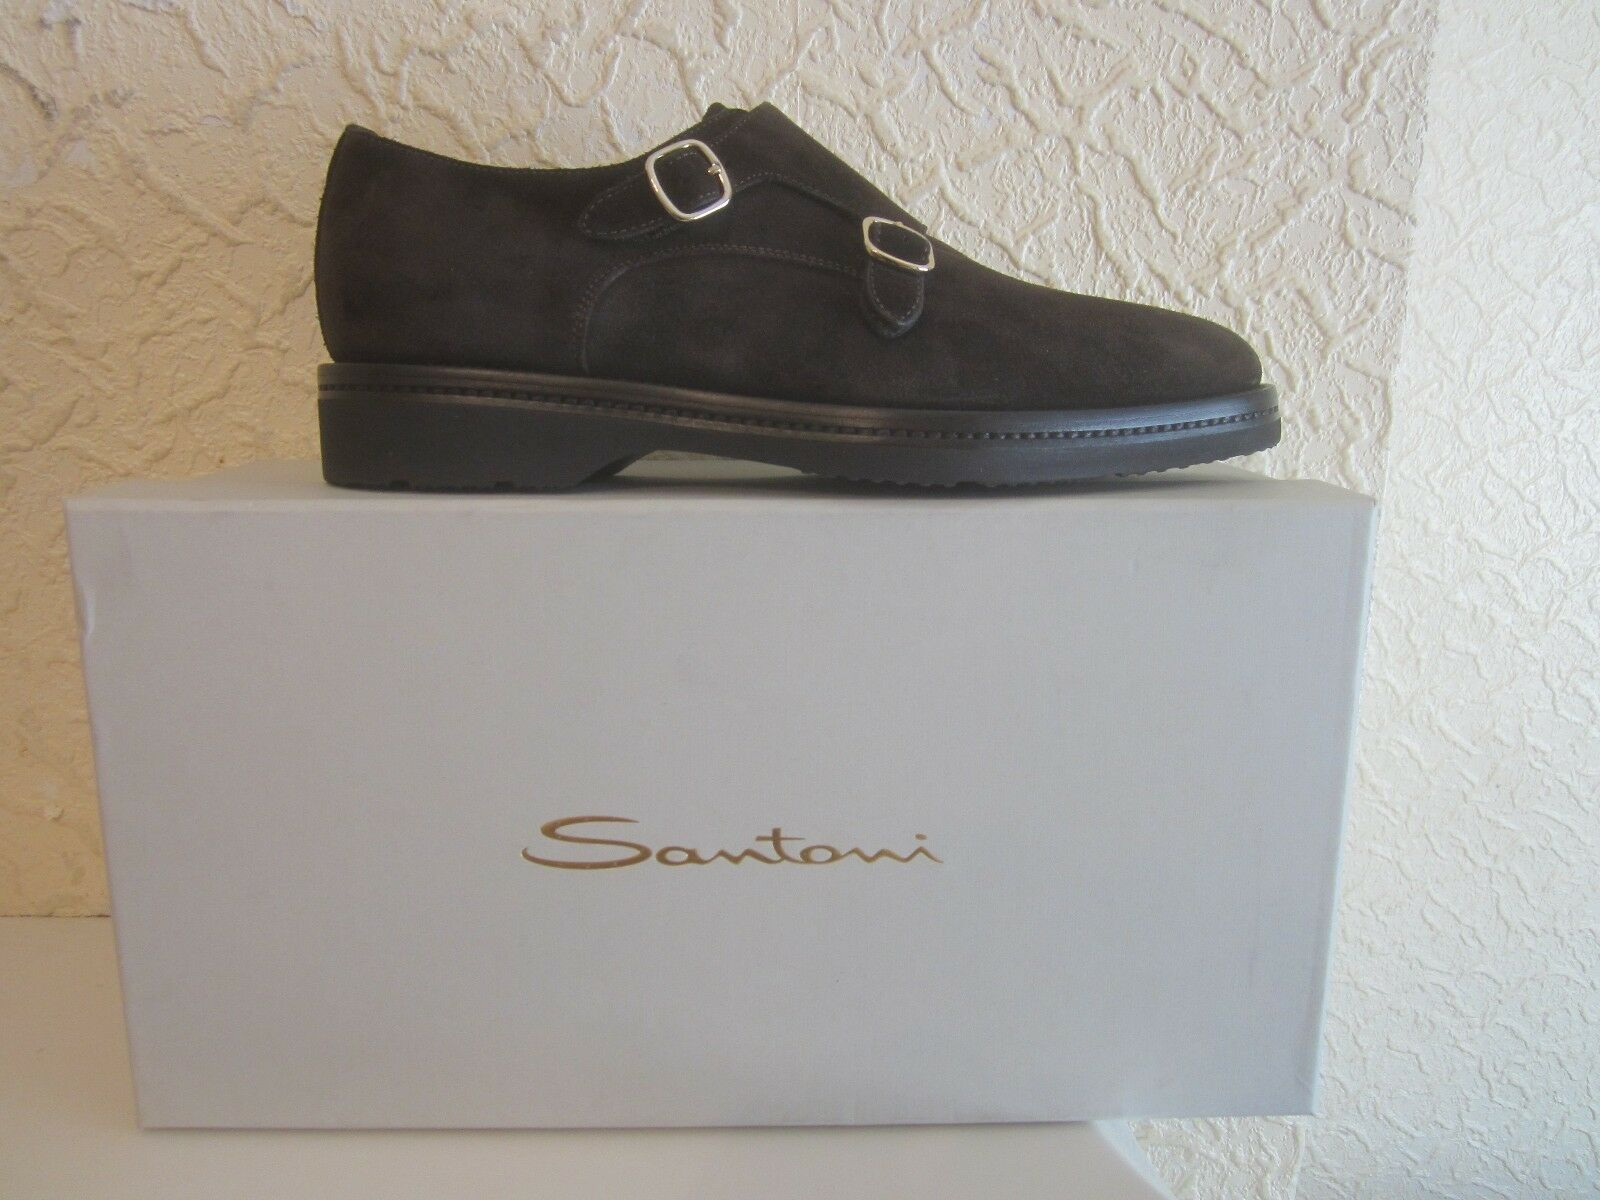 Santoni Kenneth MONACO cinghie Uomini Double's scarpe